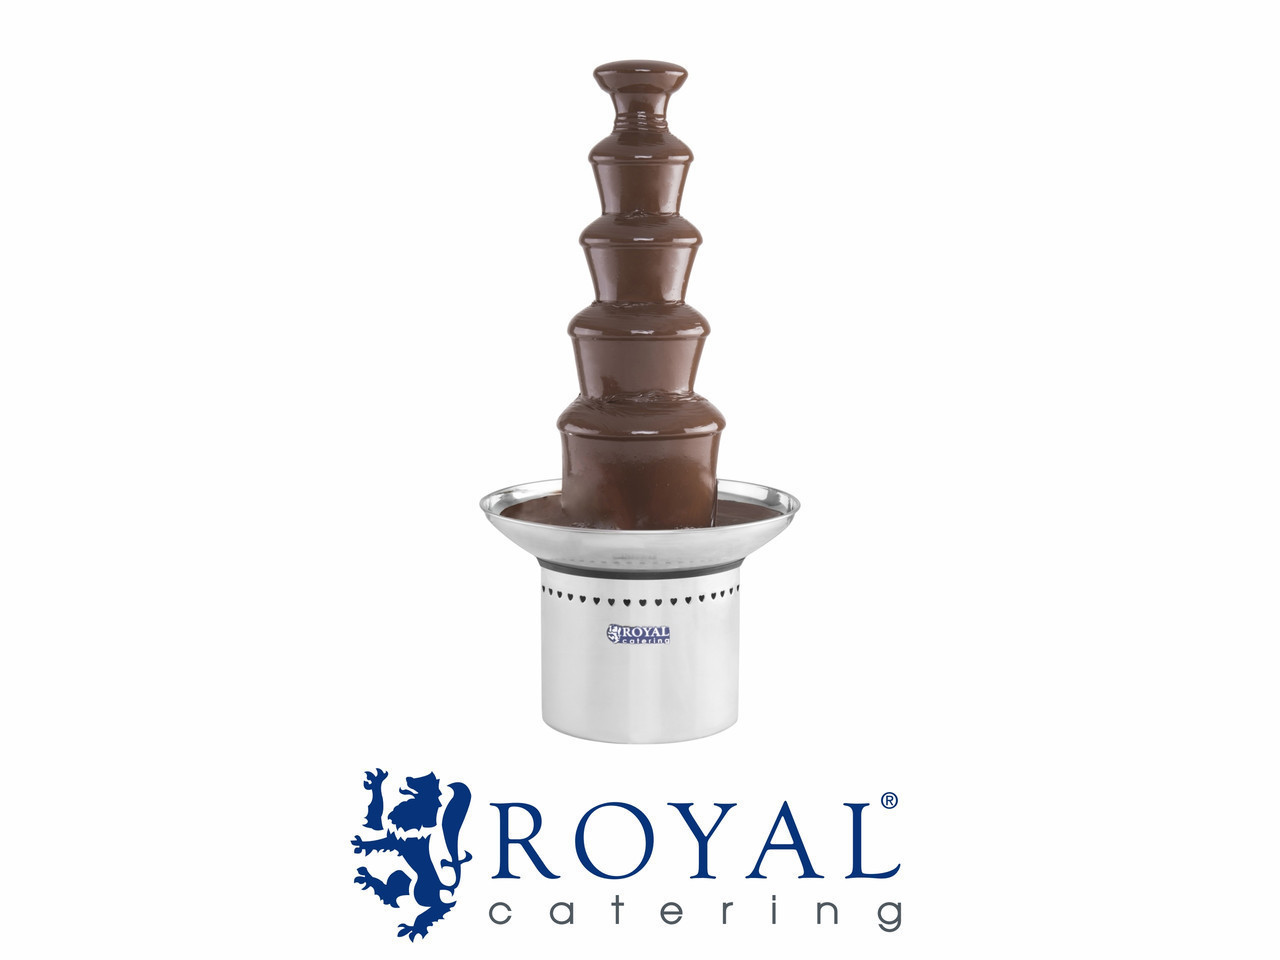 Шоколадный фонтан ROYAL